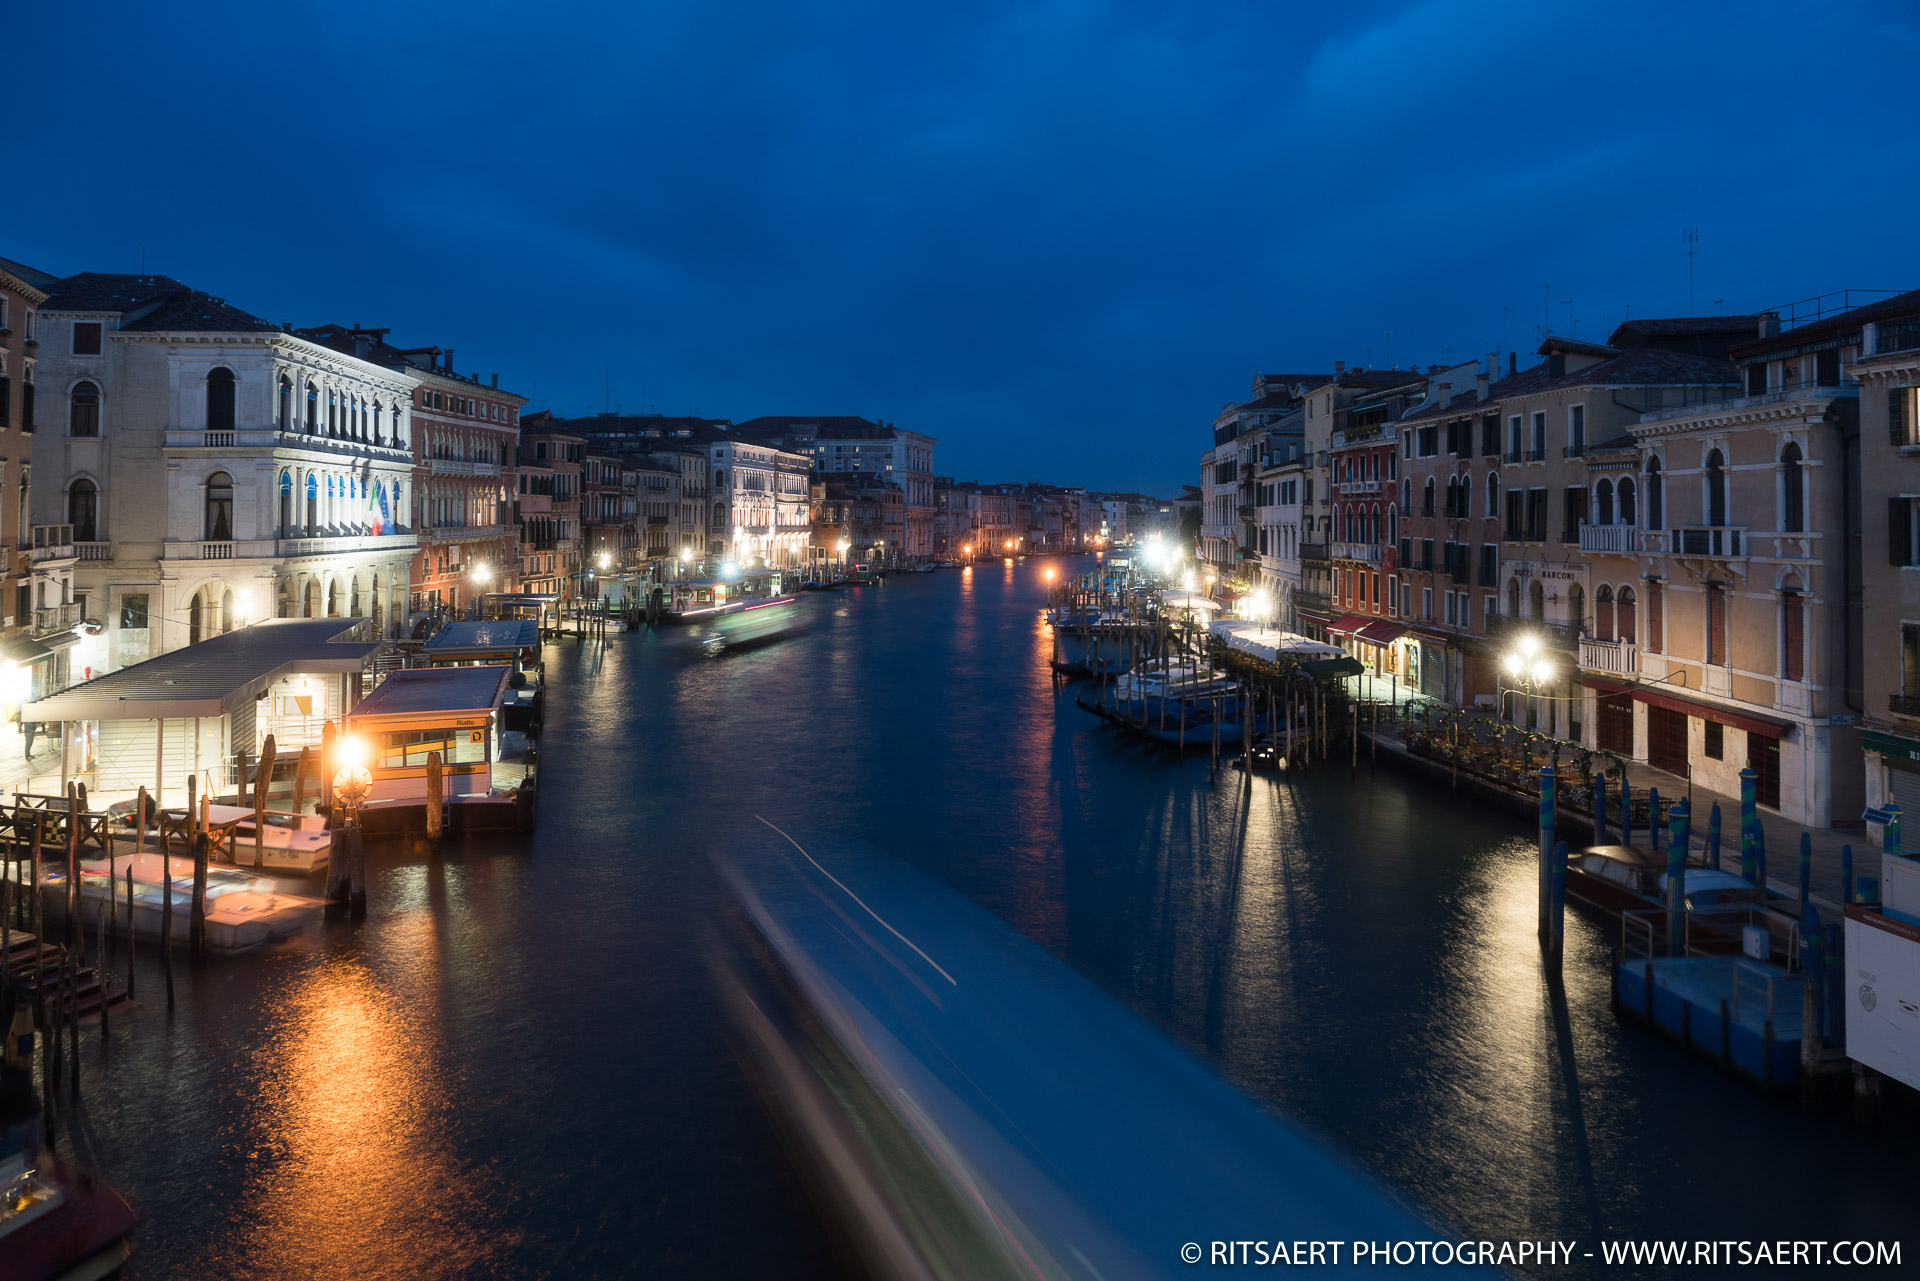 Early morning in Venice - Italy